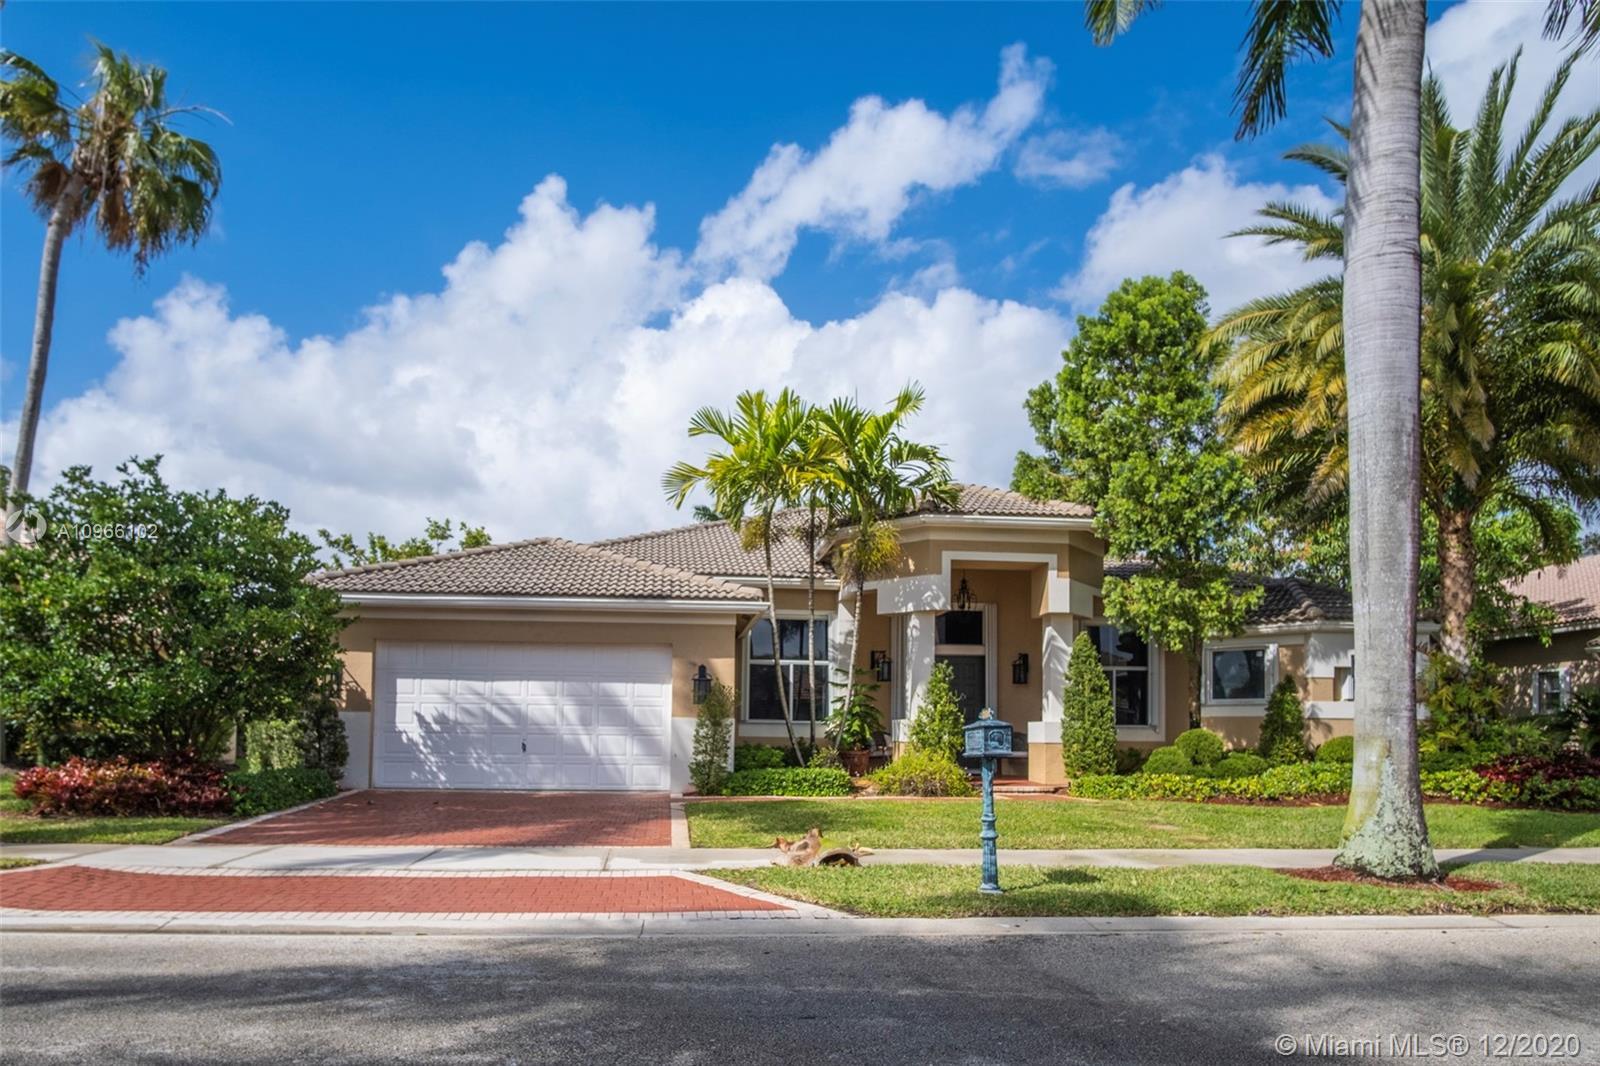 Weston Hills - 2581 Mayfair Ln, Weston, FL 33327